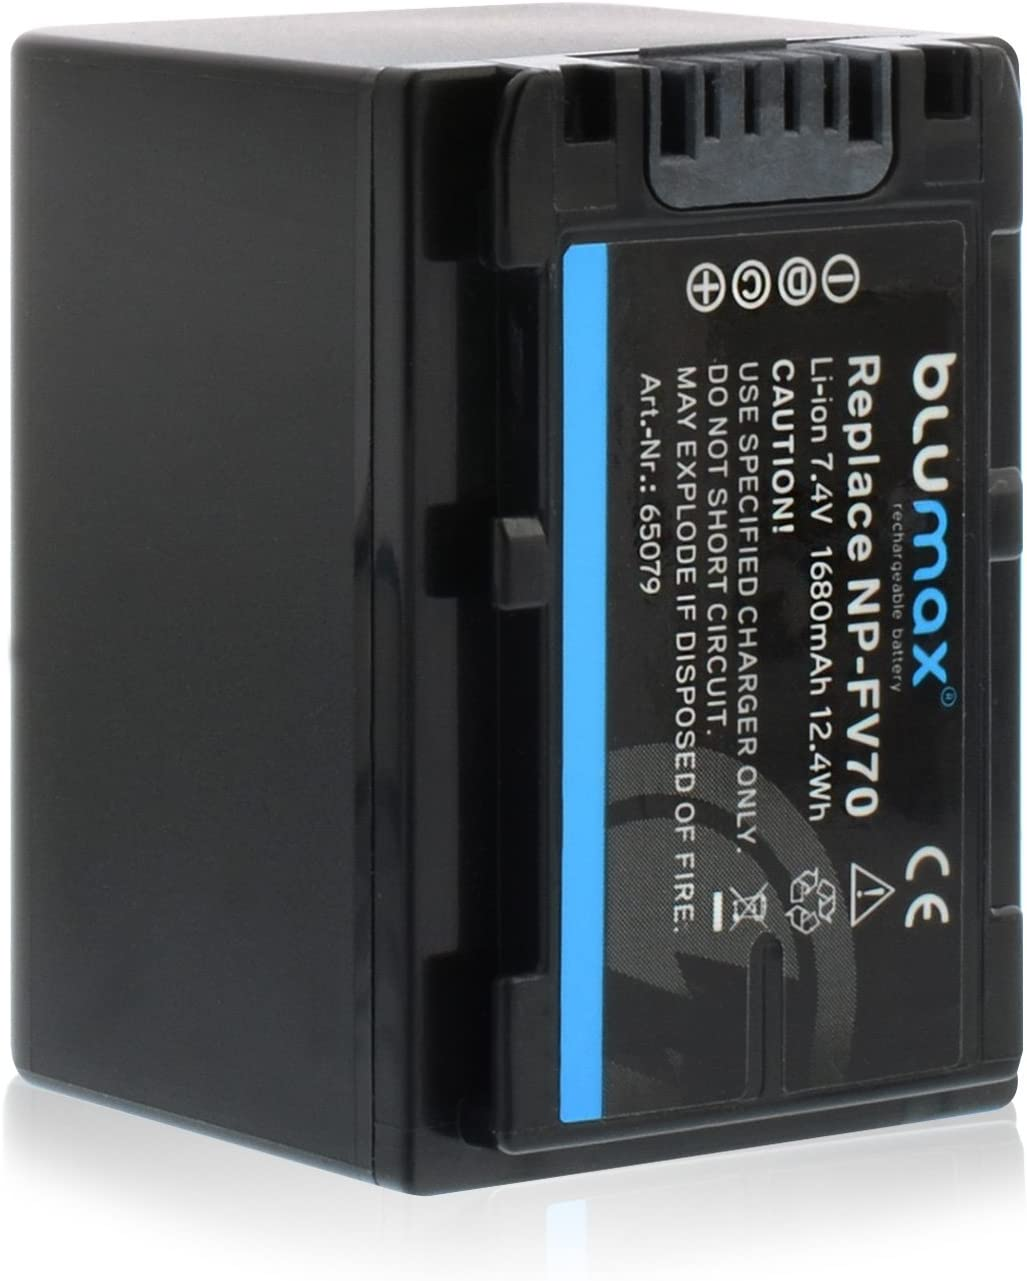 NP-FV100 Akku kompatibel mit diversen Sony Kameramodellen 3300mAh 7,4V 24,4Wh/mehr Leistung als Original akku Blumax 2X NP-FV120